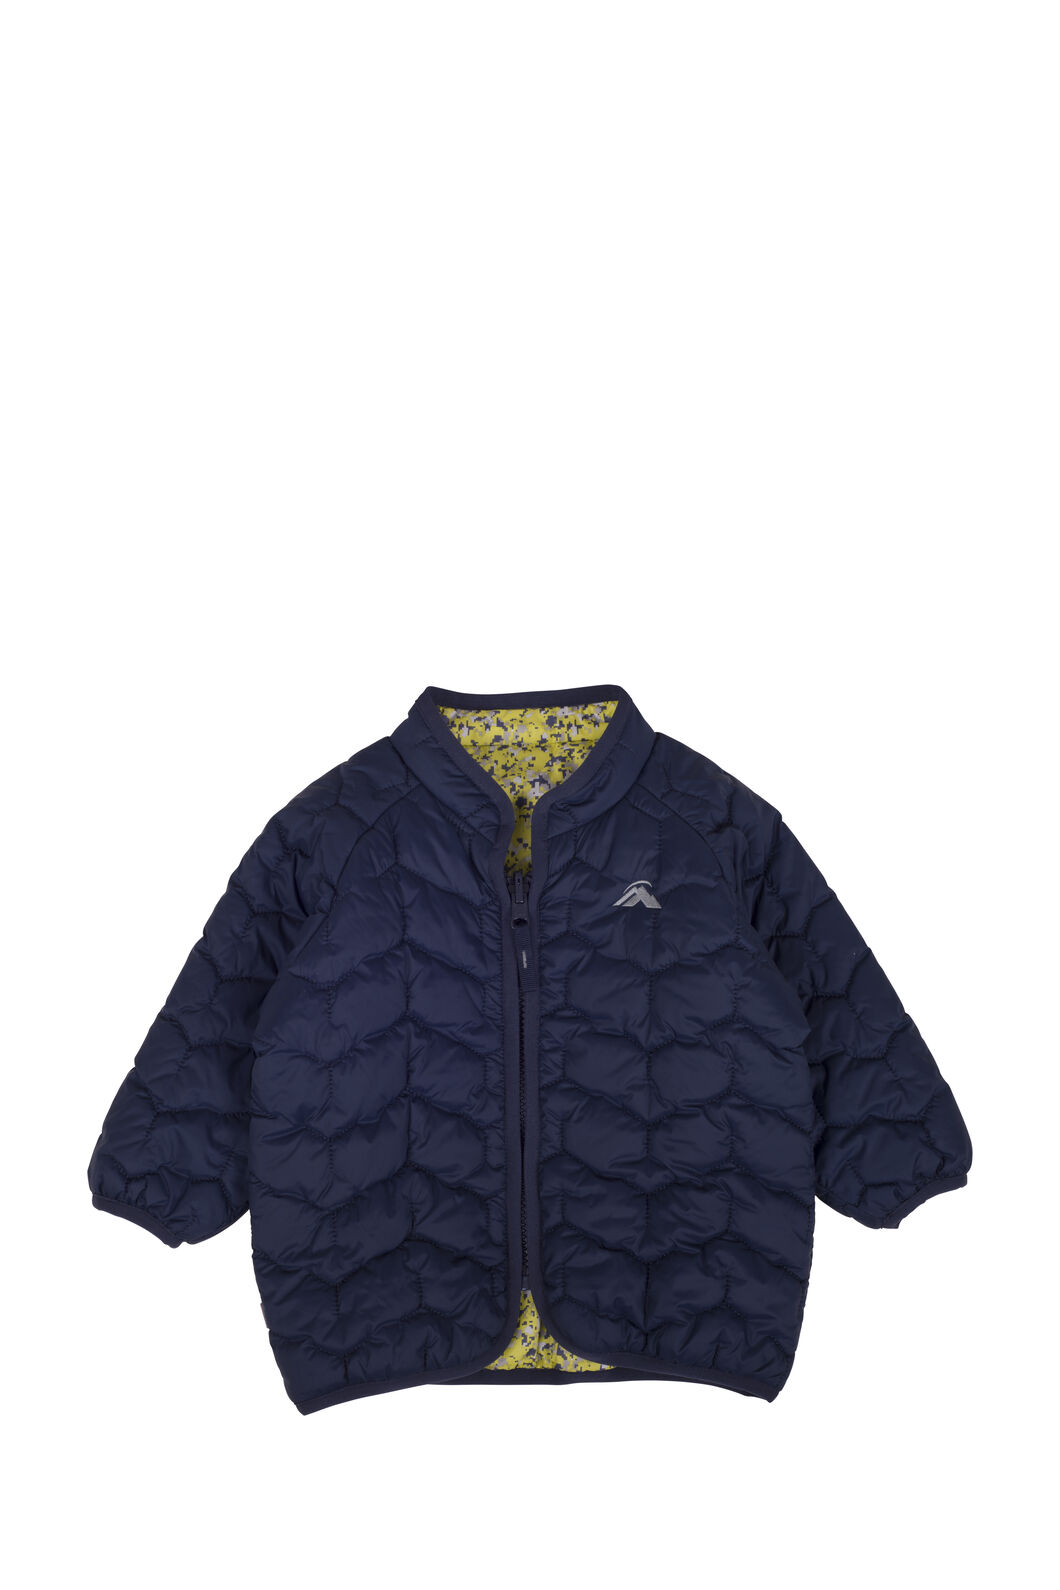 Macpac Pulsar PrimaLoft® Jacket - Baby, Black Iris/Citronelle, hi-res